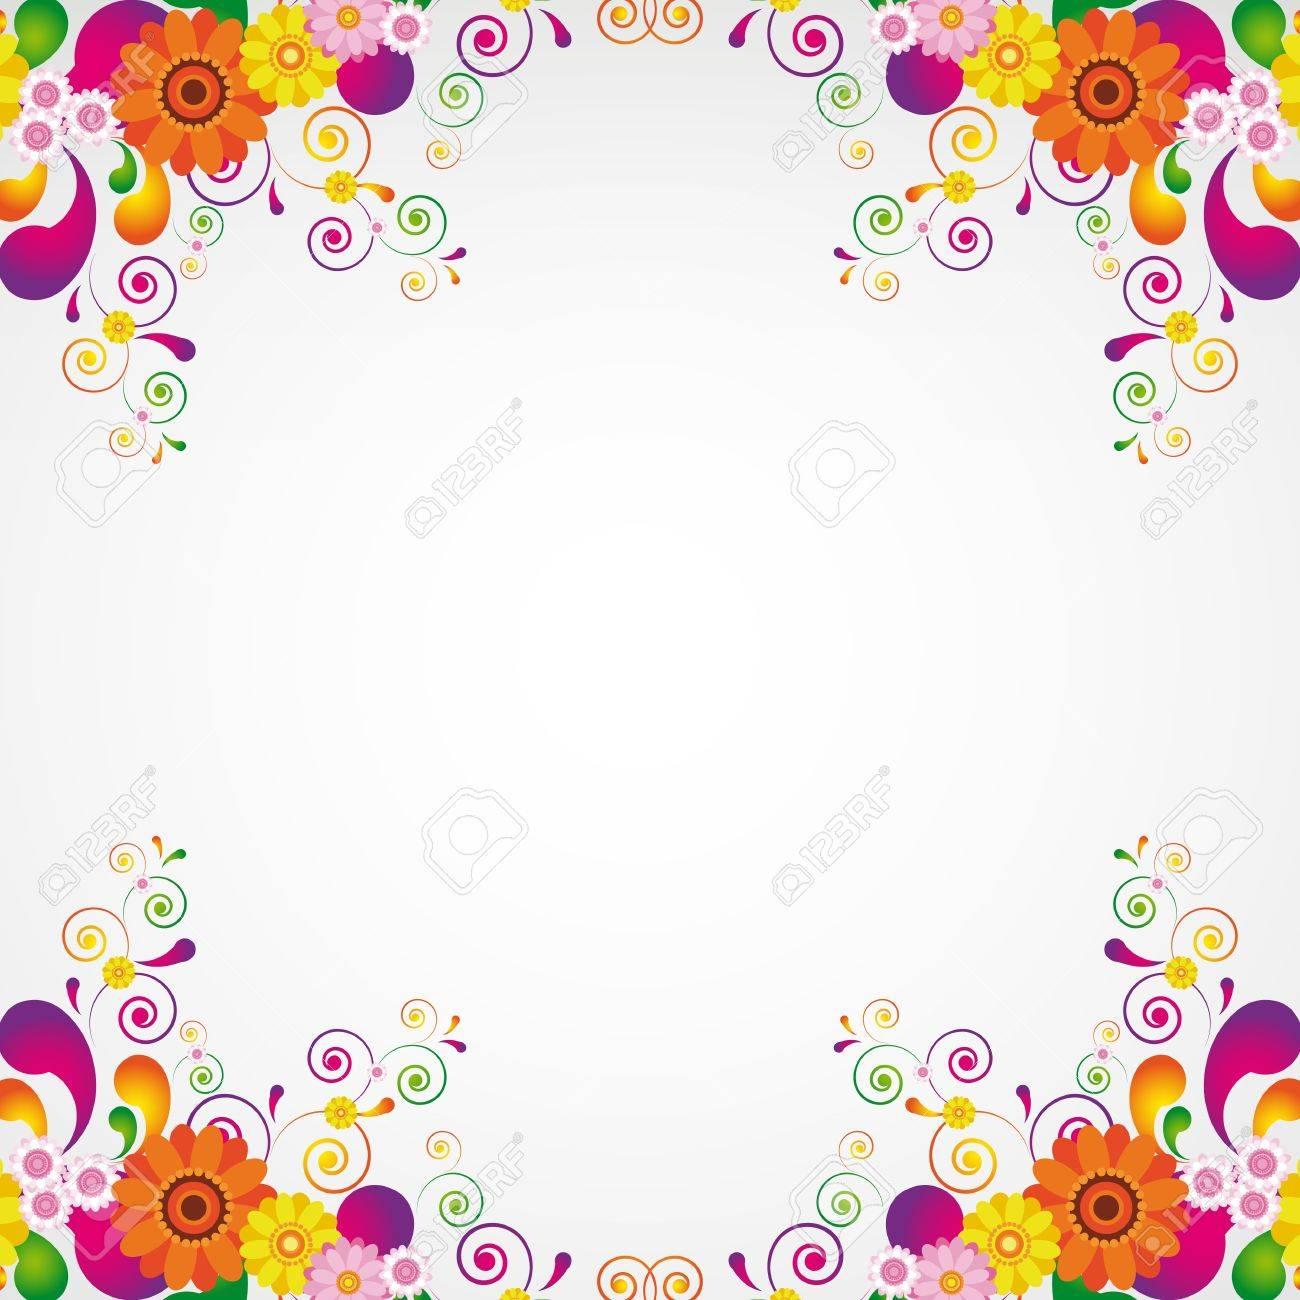 Floral design background. Stock Vector - 10400986